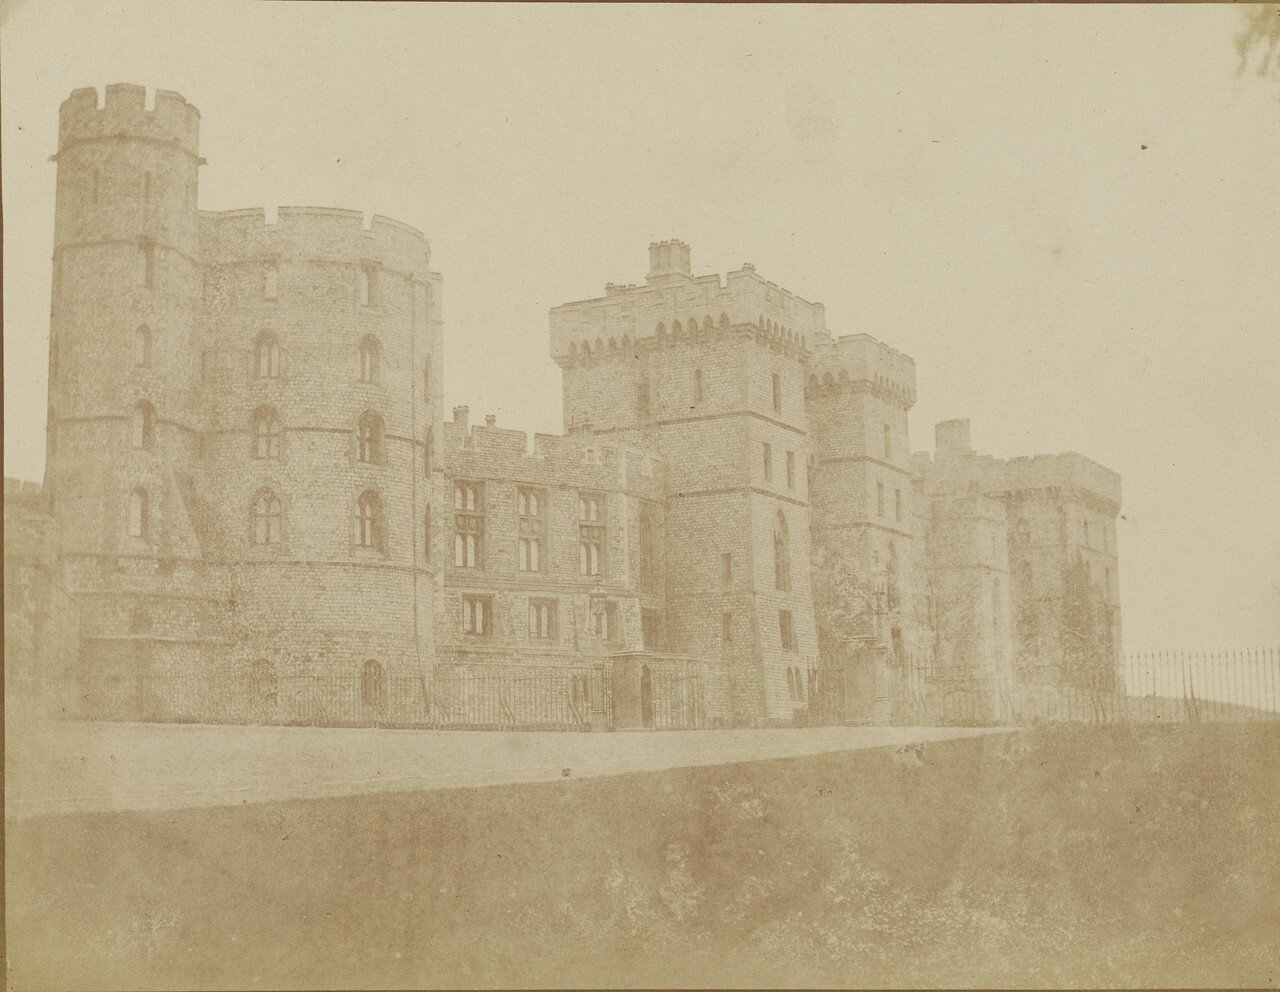 Виндзор, Англия. Виндзорский замок, Южный фасад